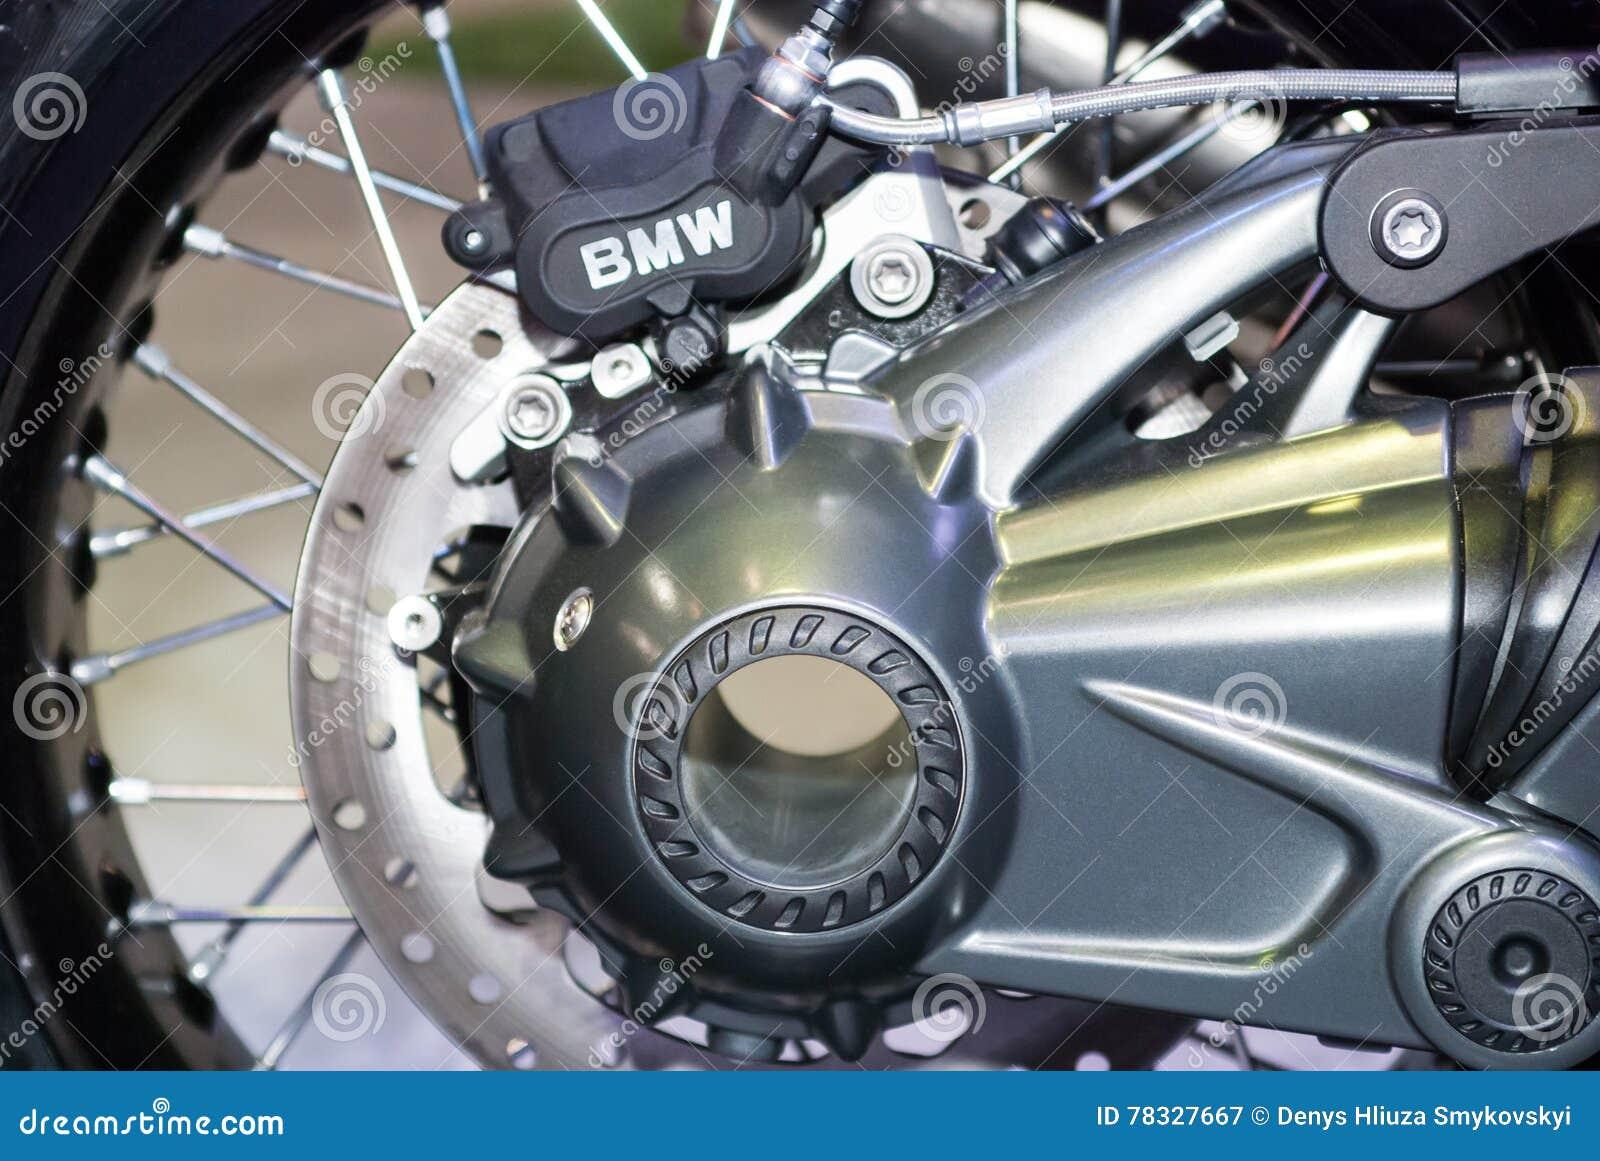 Sport bike-details